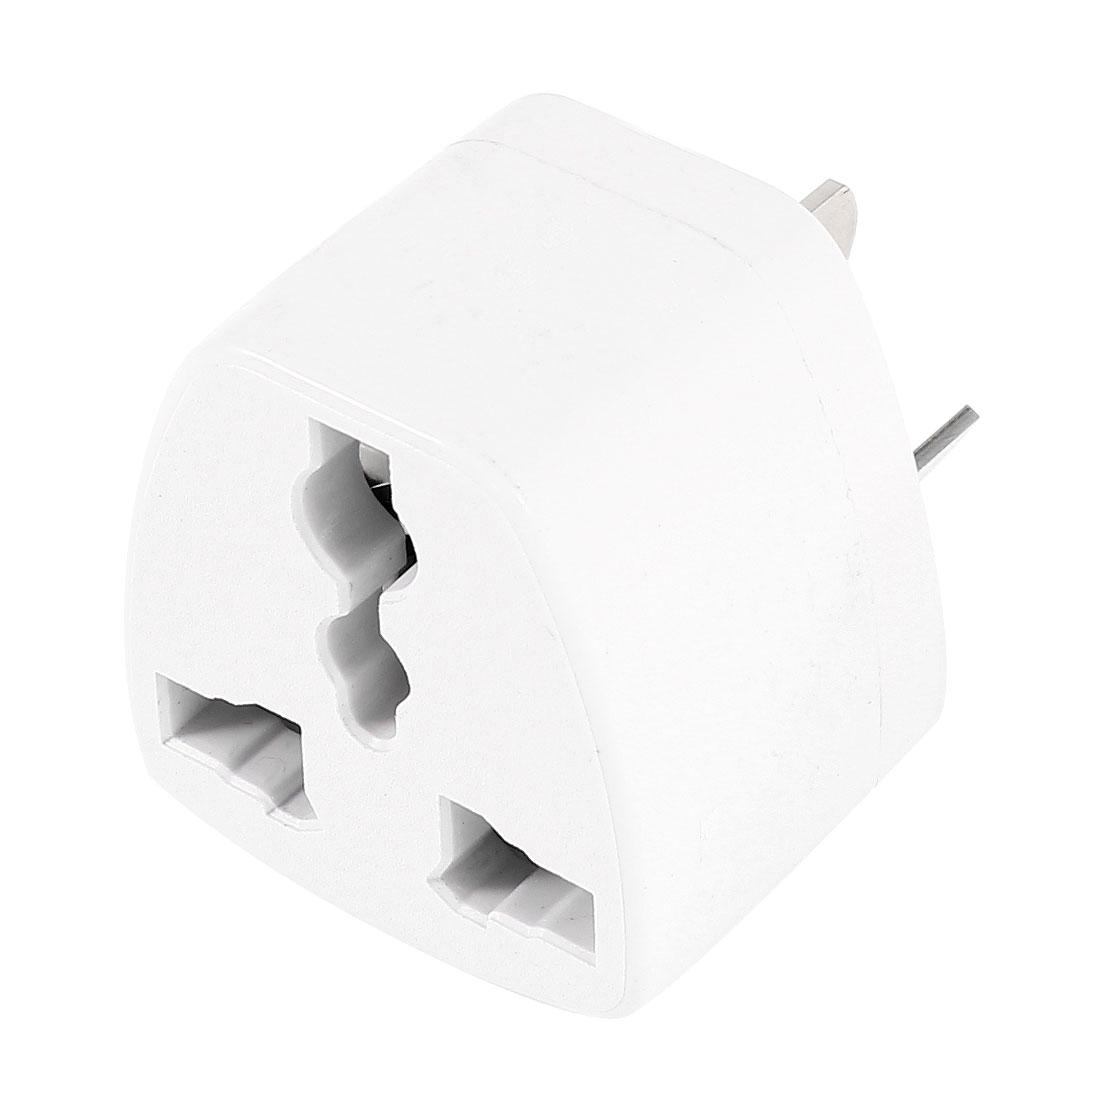 AU 3 Pin Plug to EU UK US Socket Travel Adapter Converter AC 250V 10A